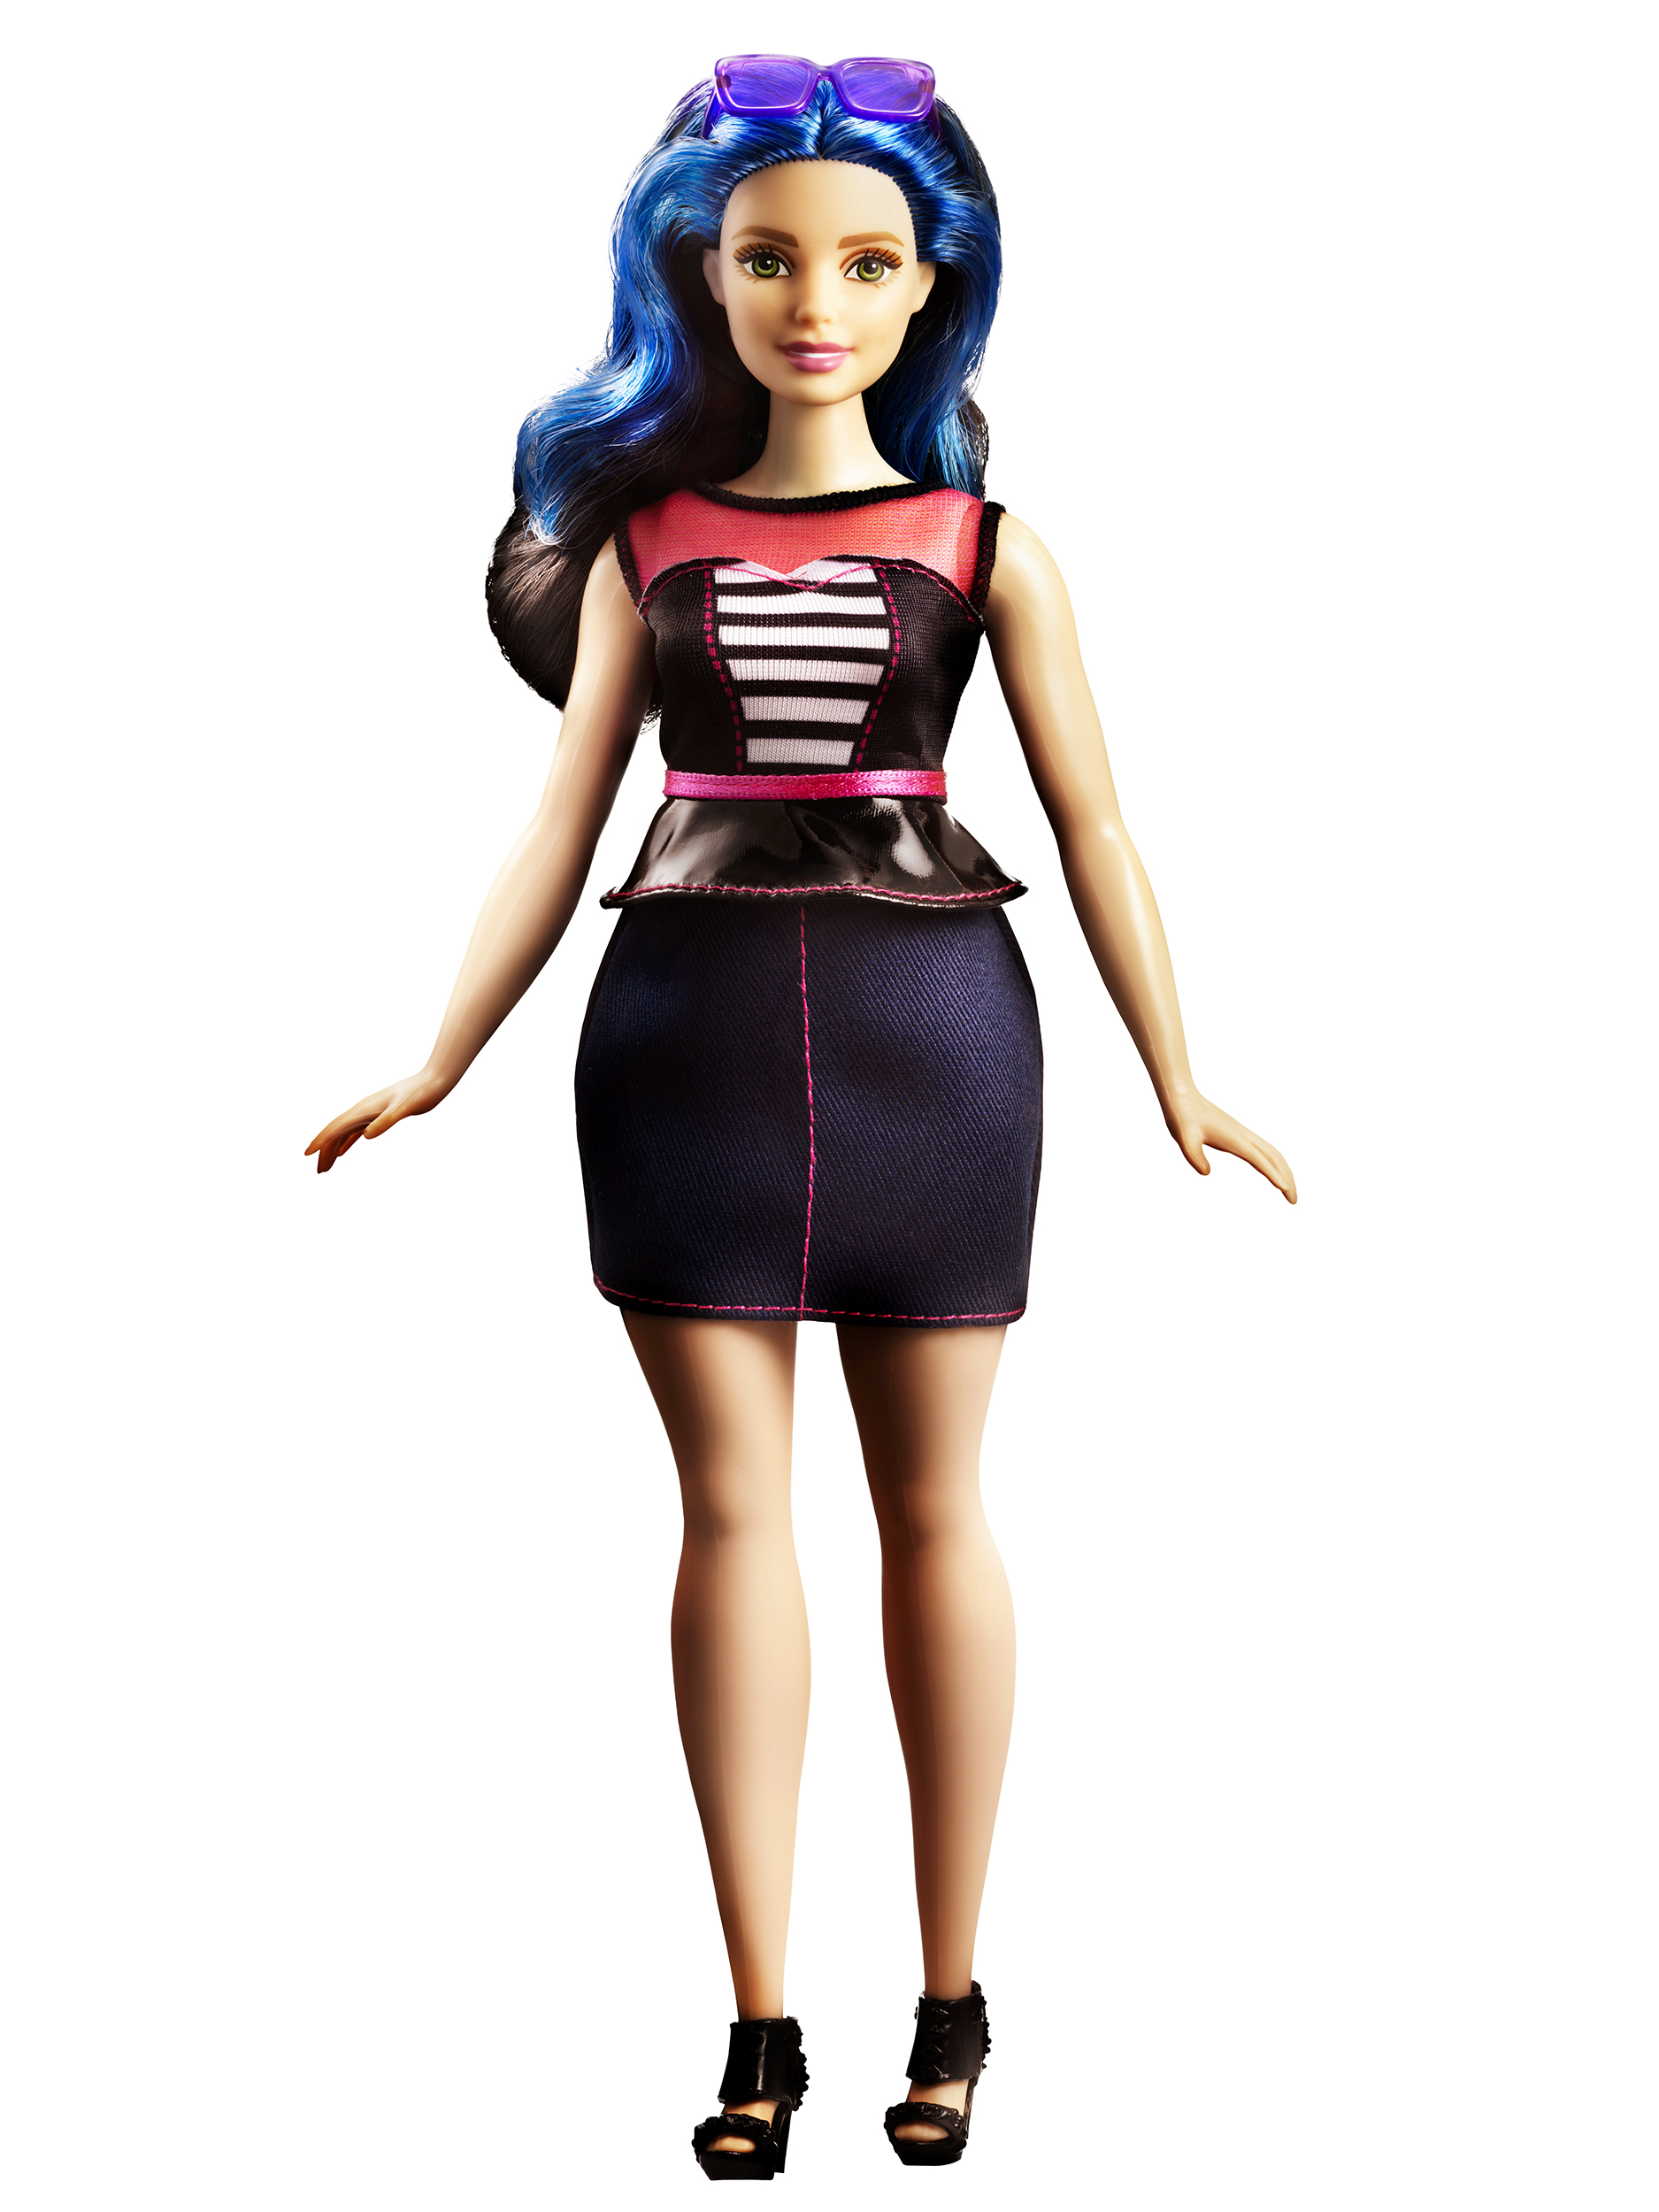 Mattel's new Curvy Barbie